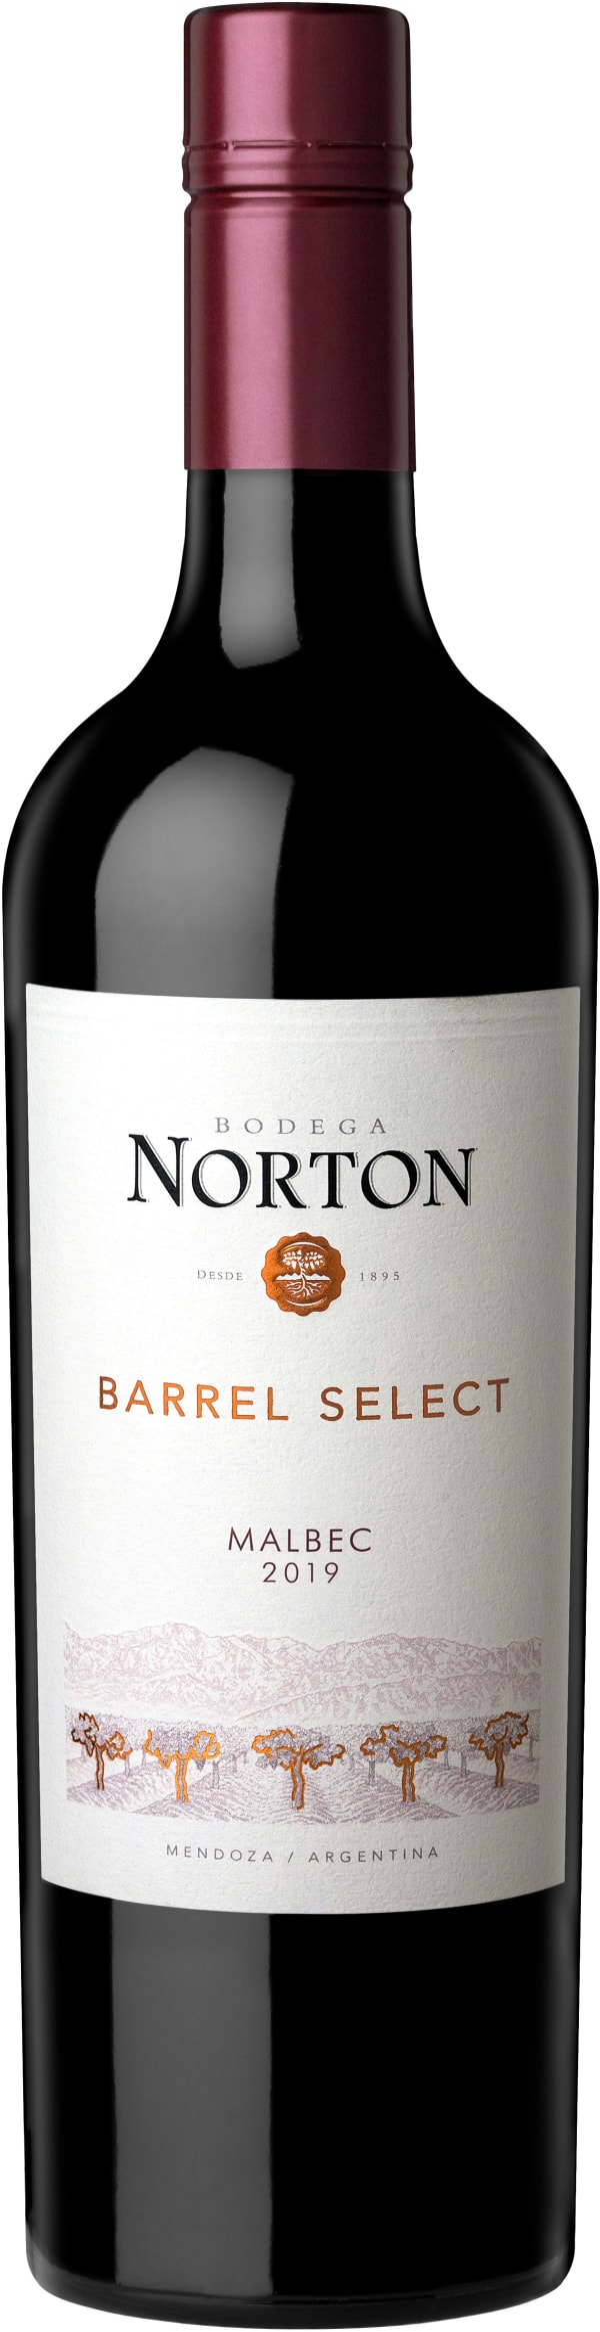 Norton Barrel Select Malbec 2020